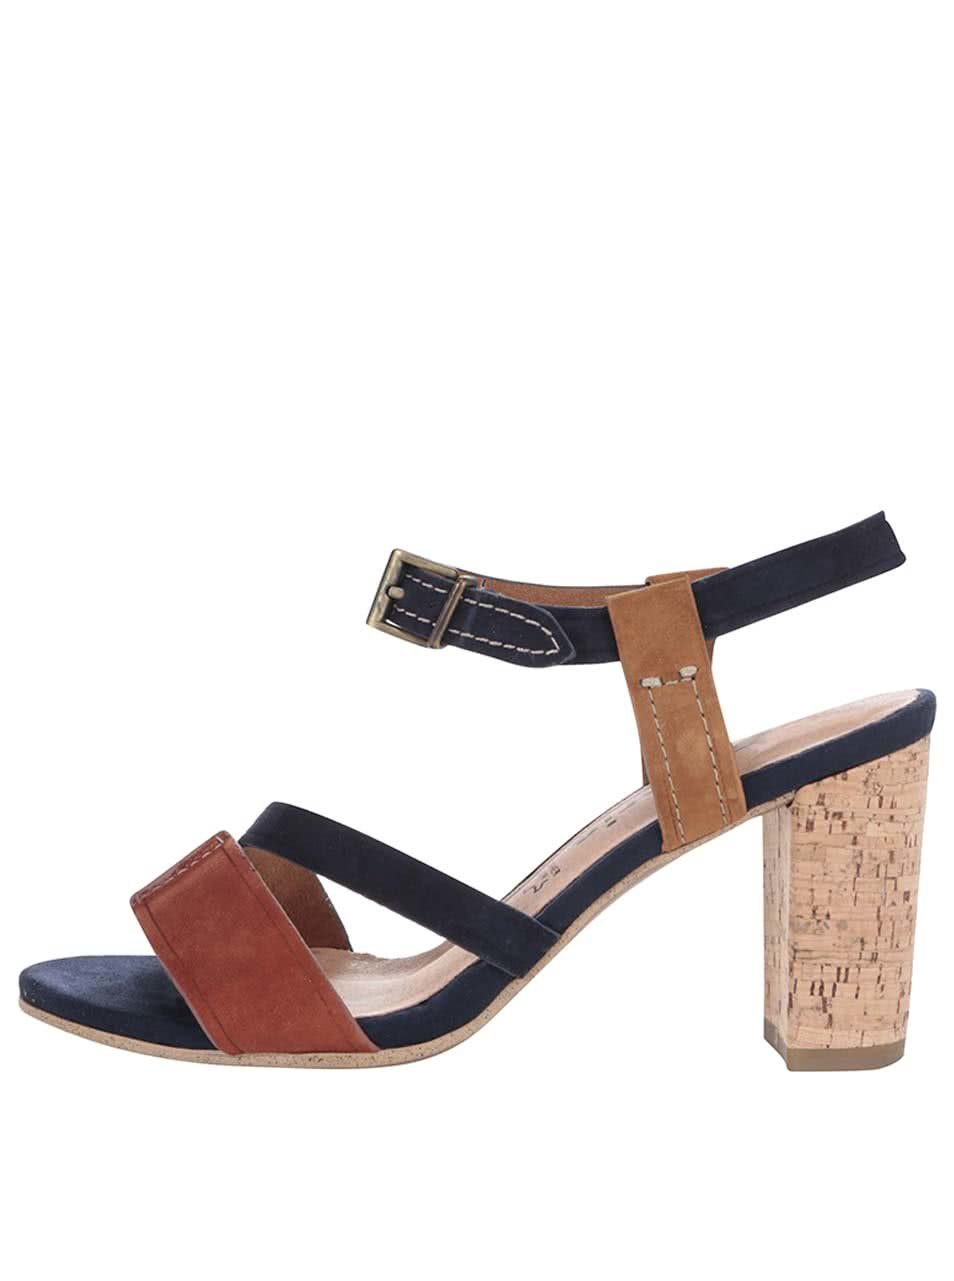 Hnědo-modré kožené boty na podpatku Tamaris 0f9c6b8435